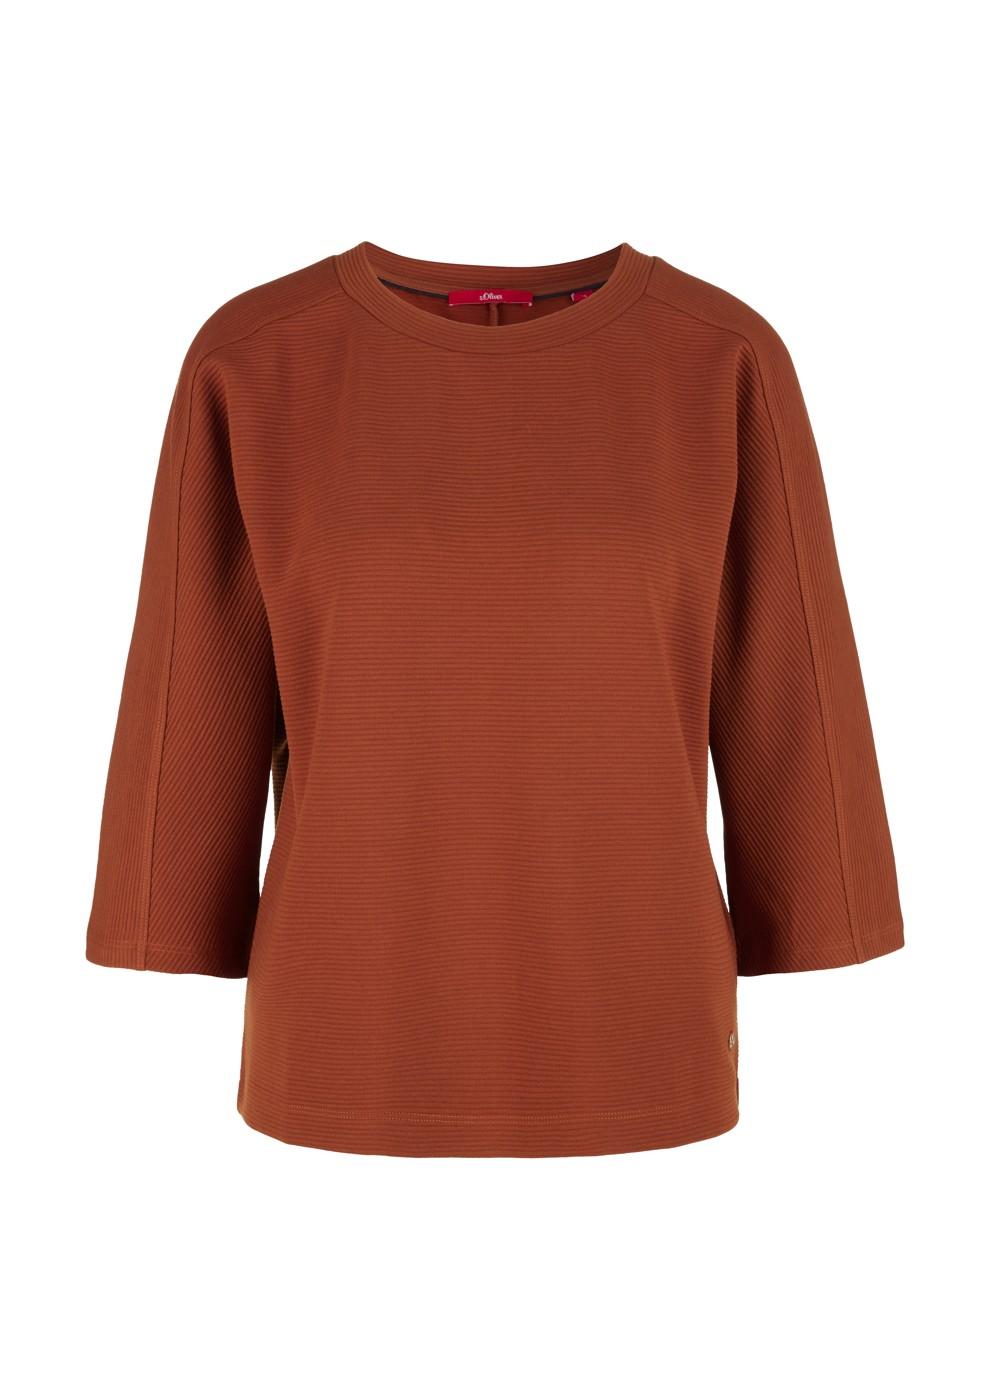 120 Sweatshirt 3/4 Arm - Damen